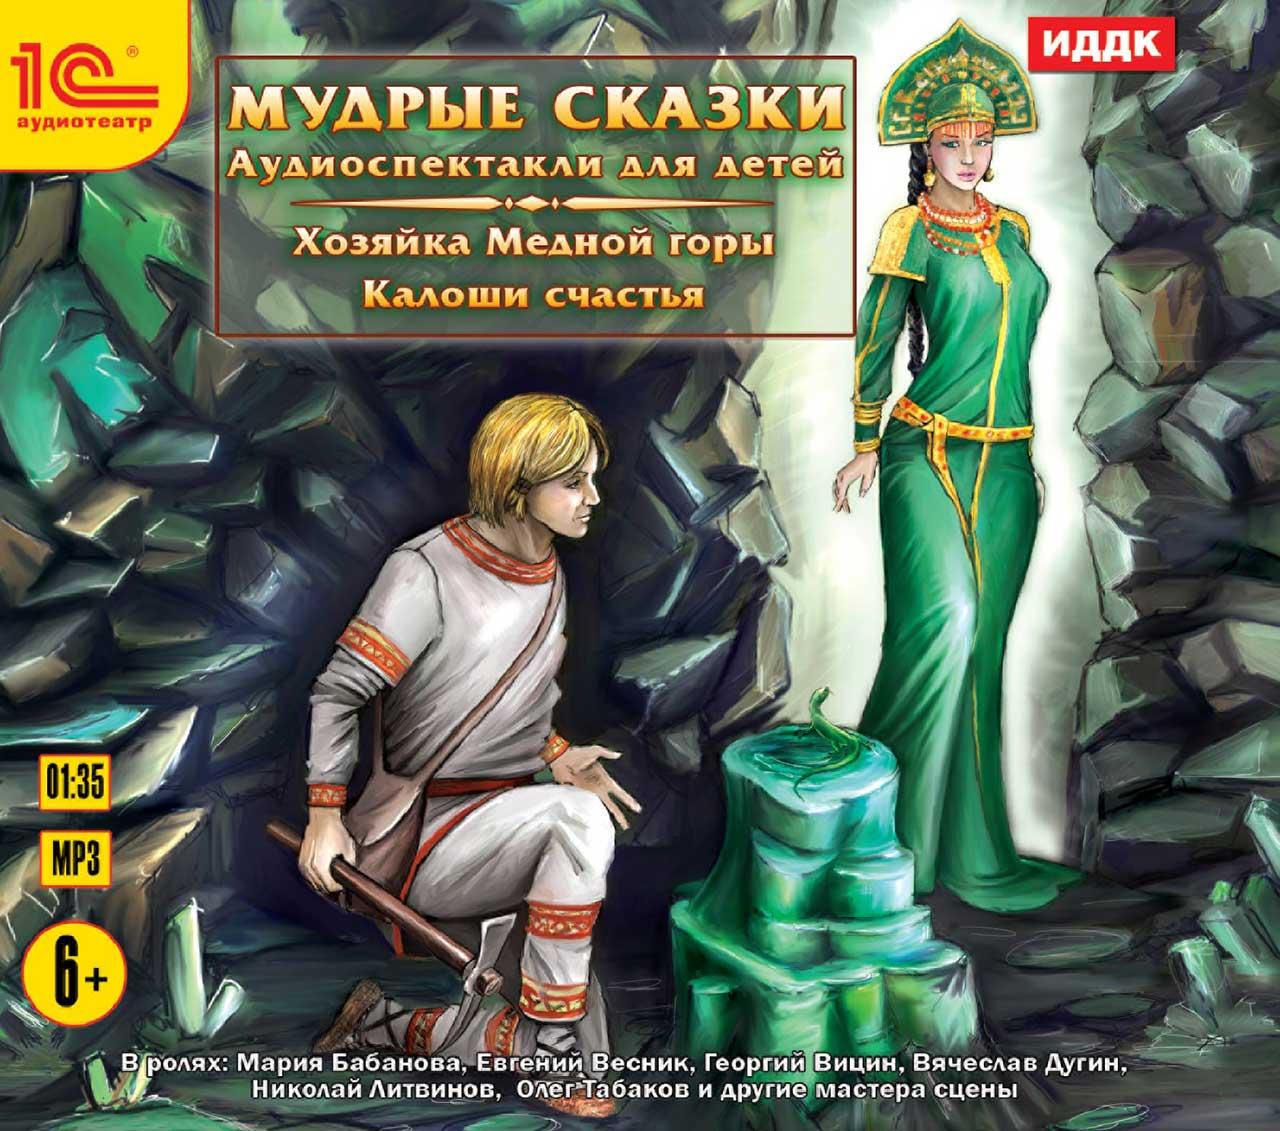 CDmp3 Мудрые сказки. Аудиоспектакли для детей